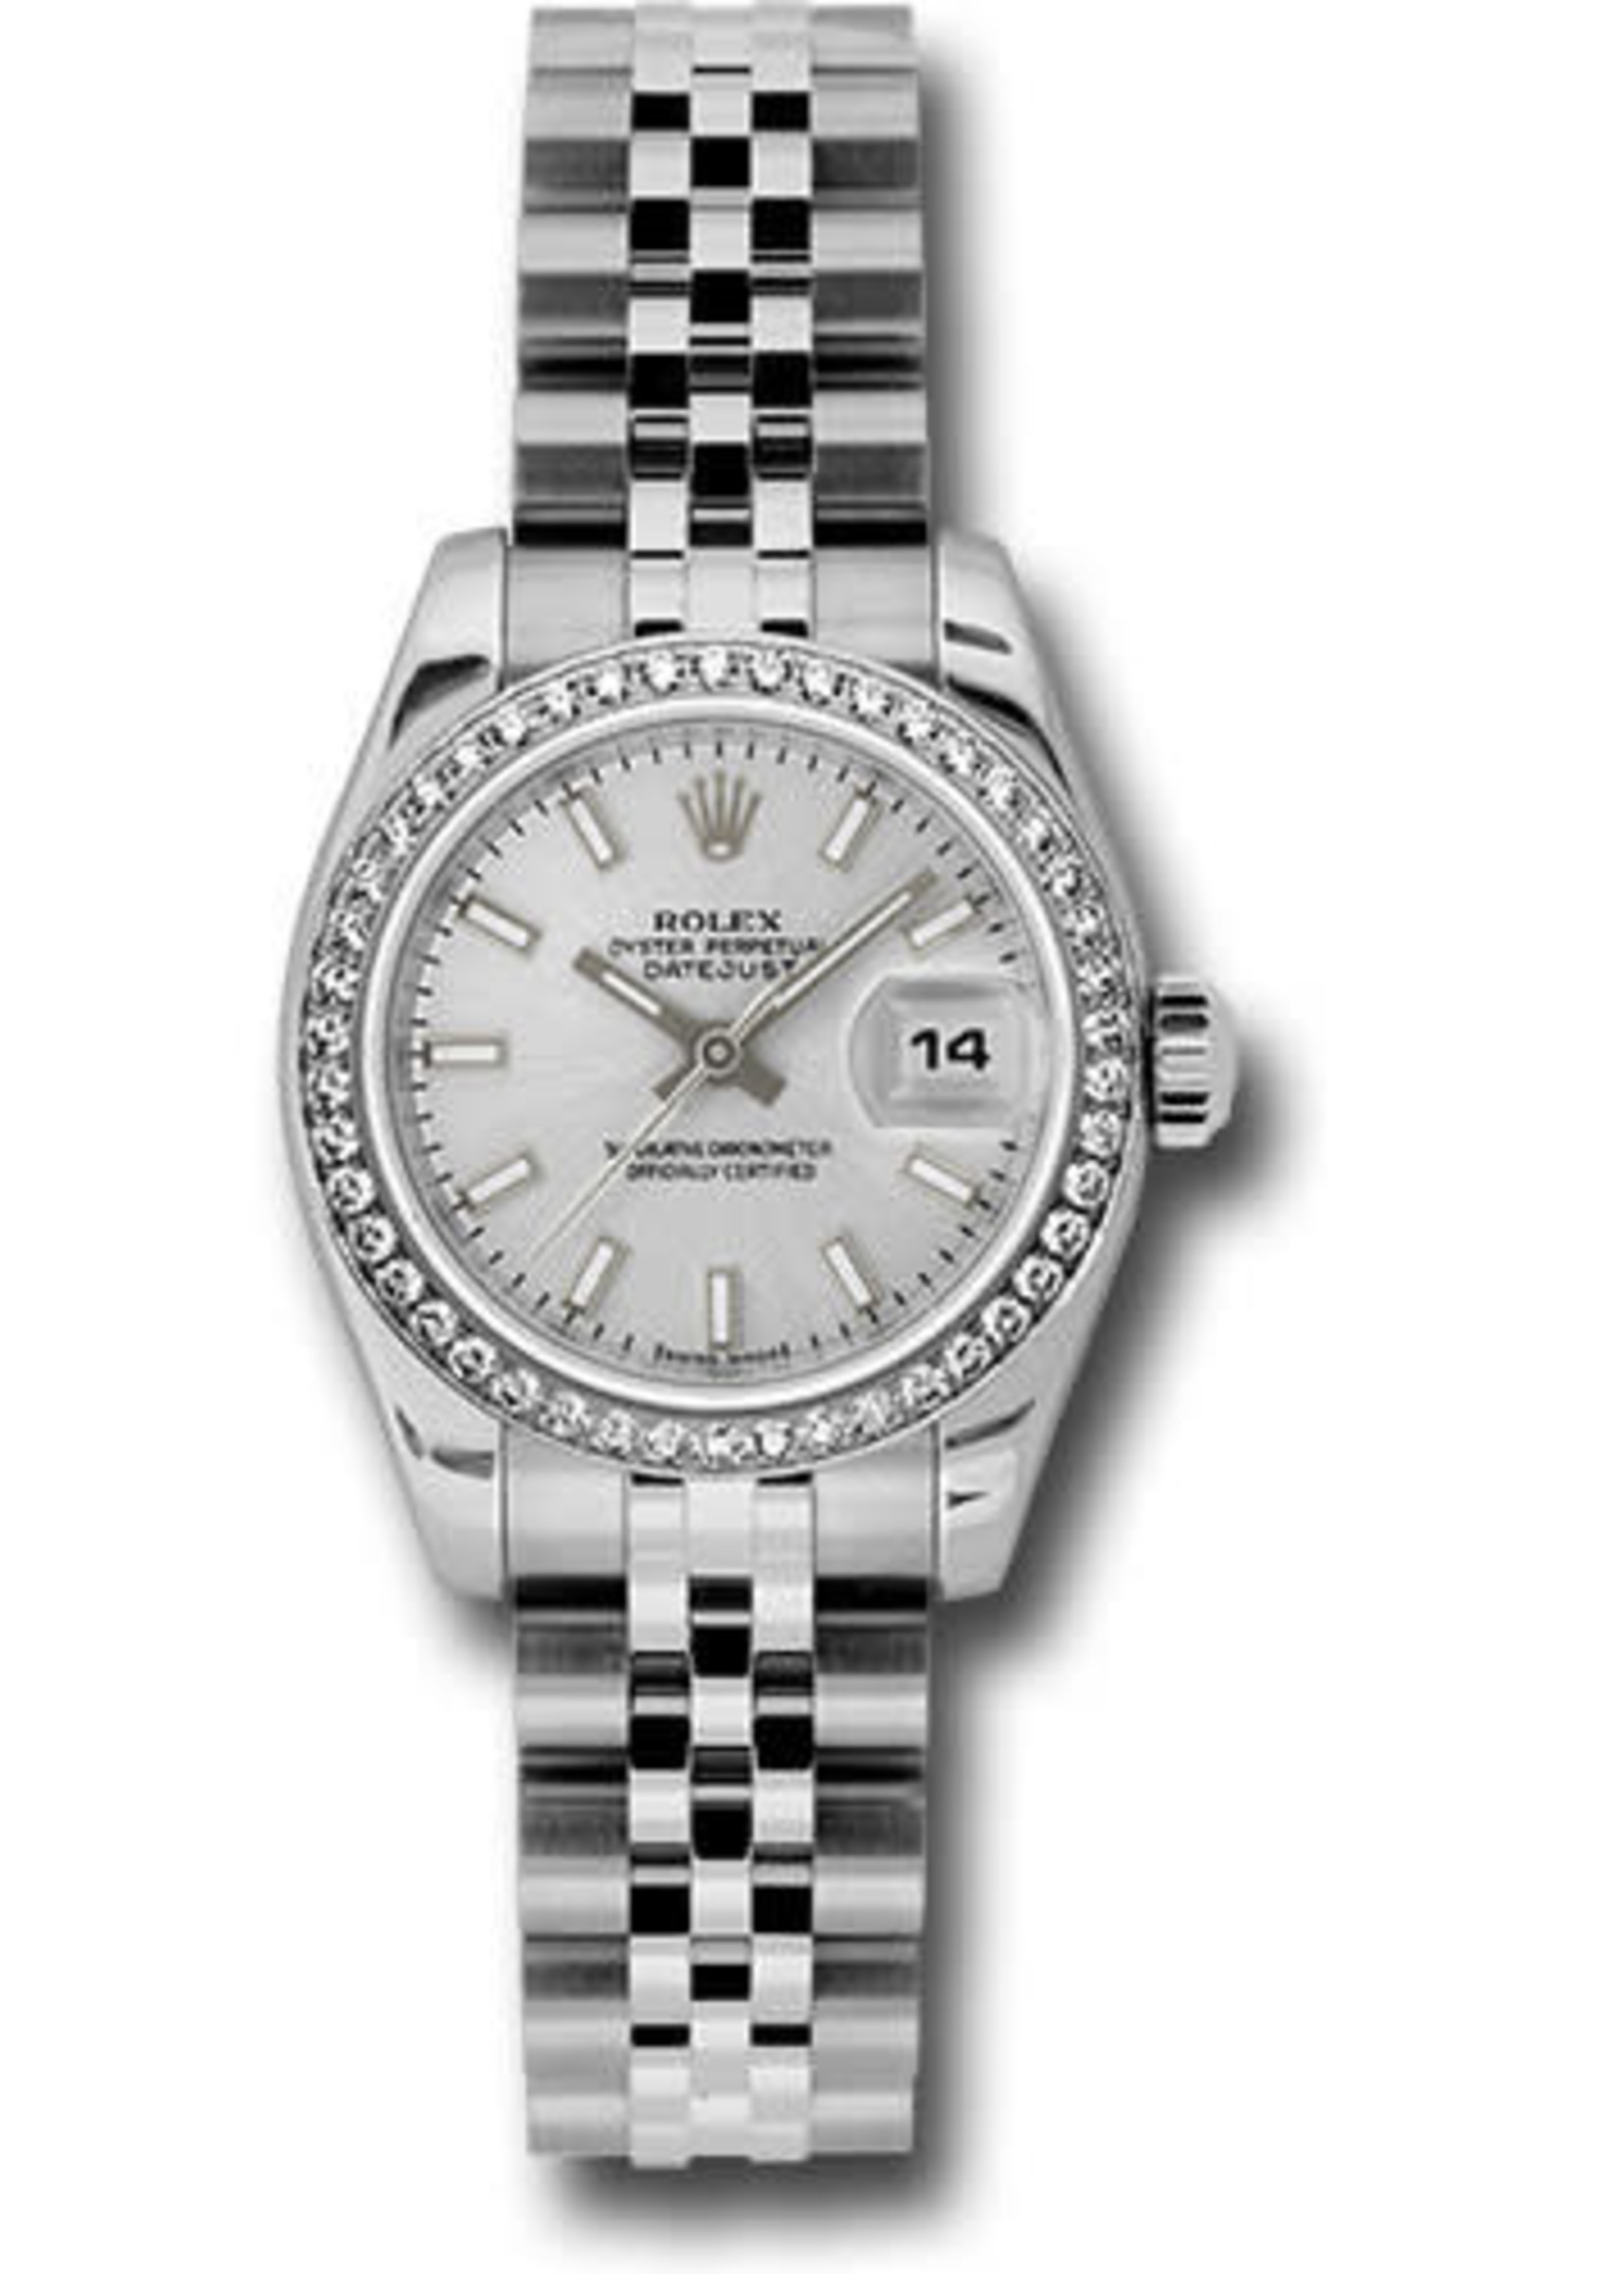 Rolex Watches ROLEX DATEJUST LADY 26MM (2010 B+P) #179384